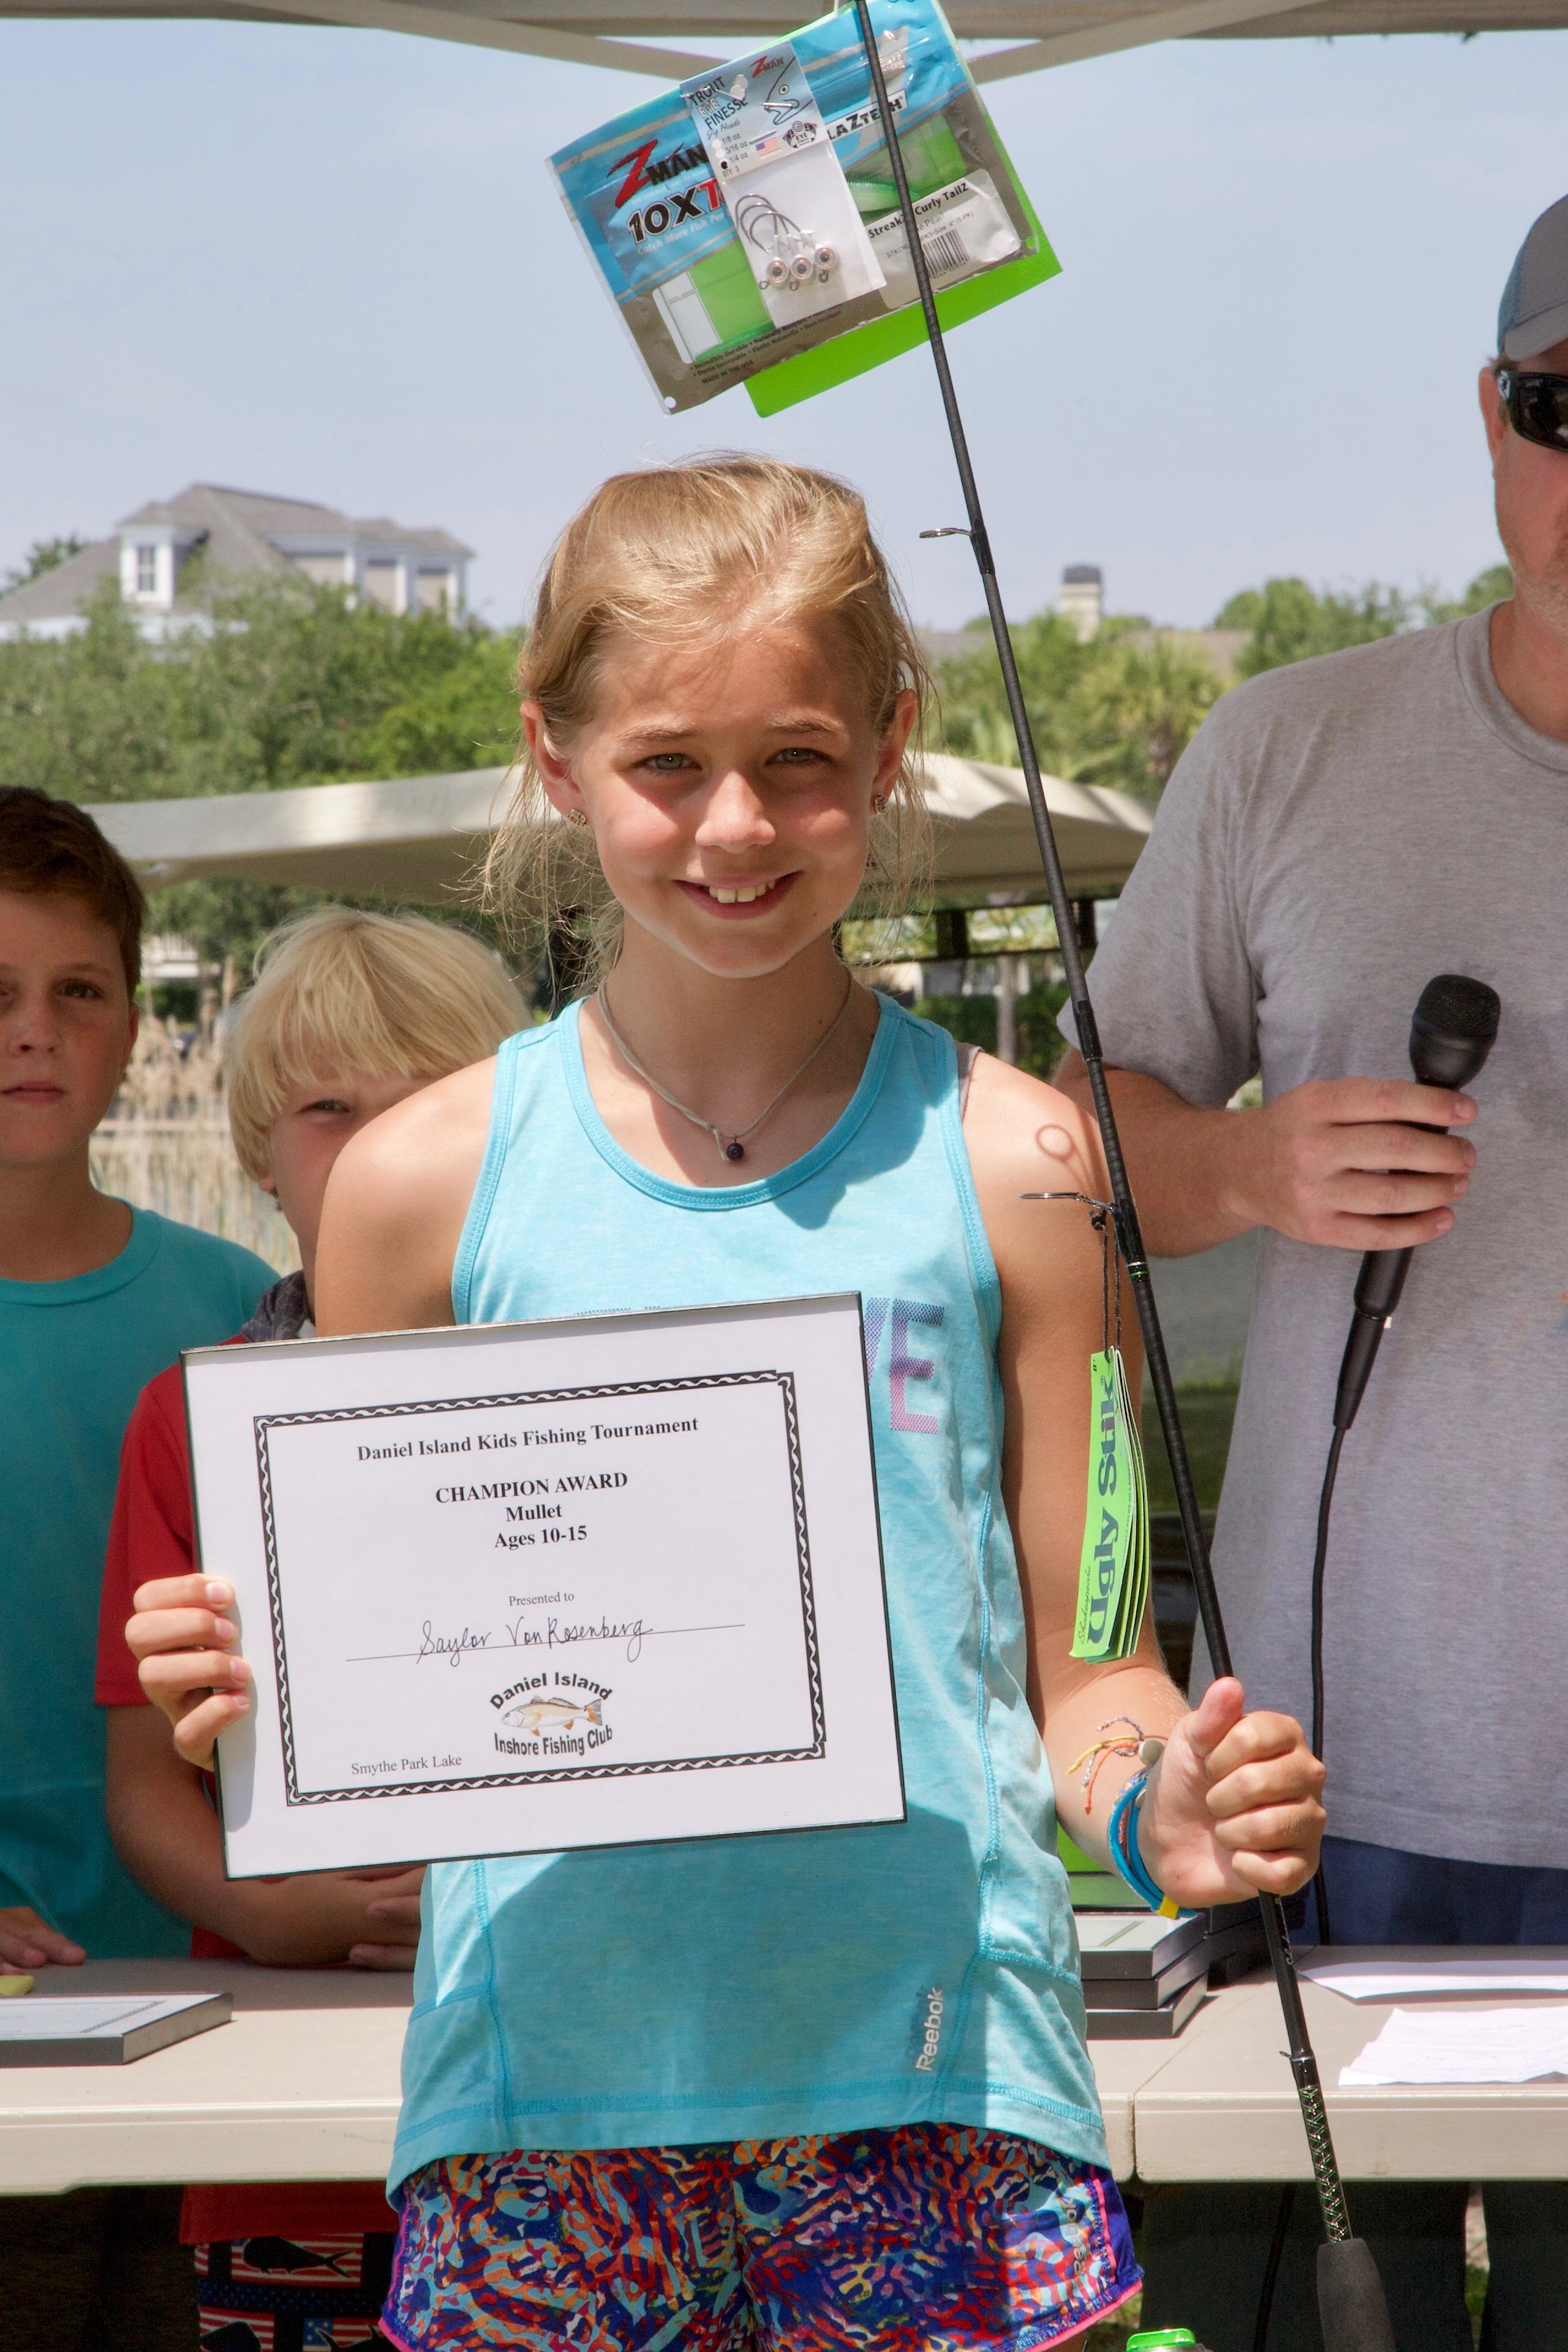 Saylor Von Rosenberg – Champion Award, Mullet, Ages 10-15.